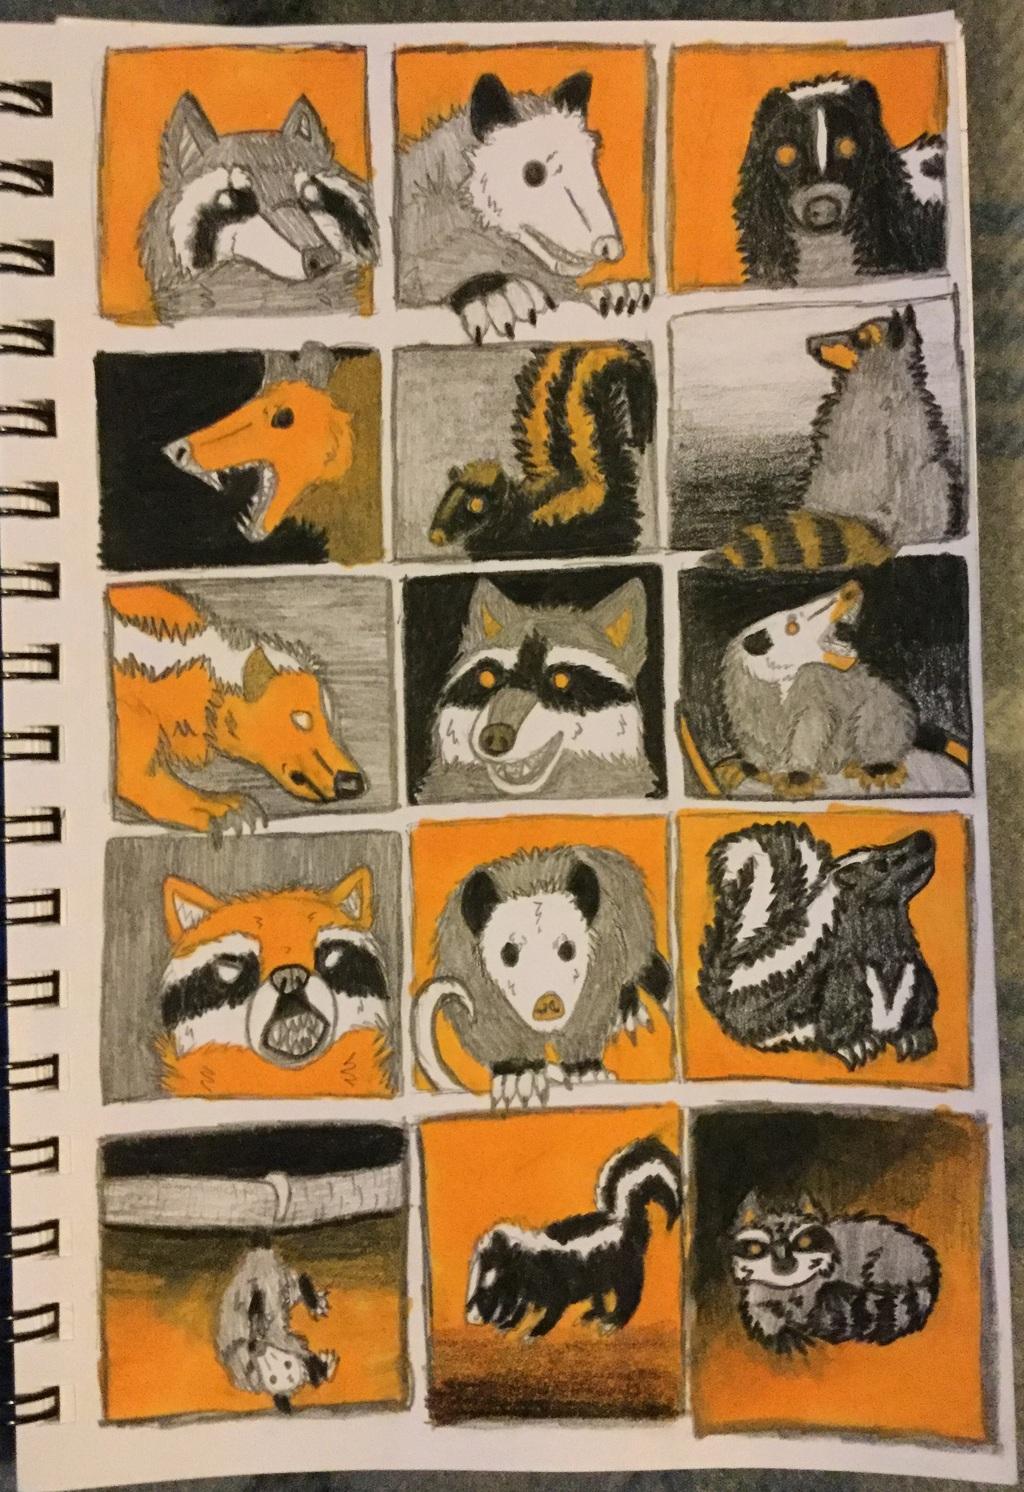 Raccoon, Opossum, and Skunk Thumbnails